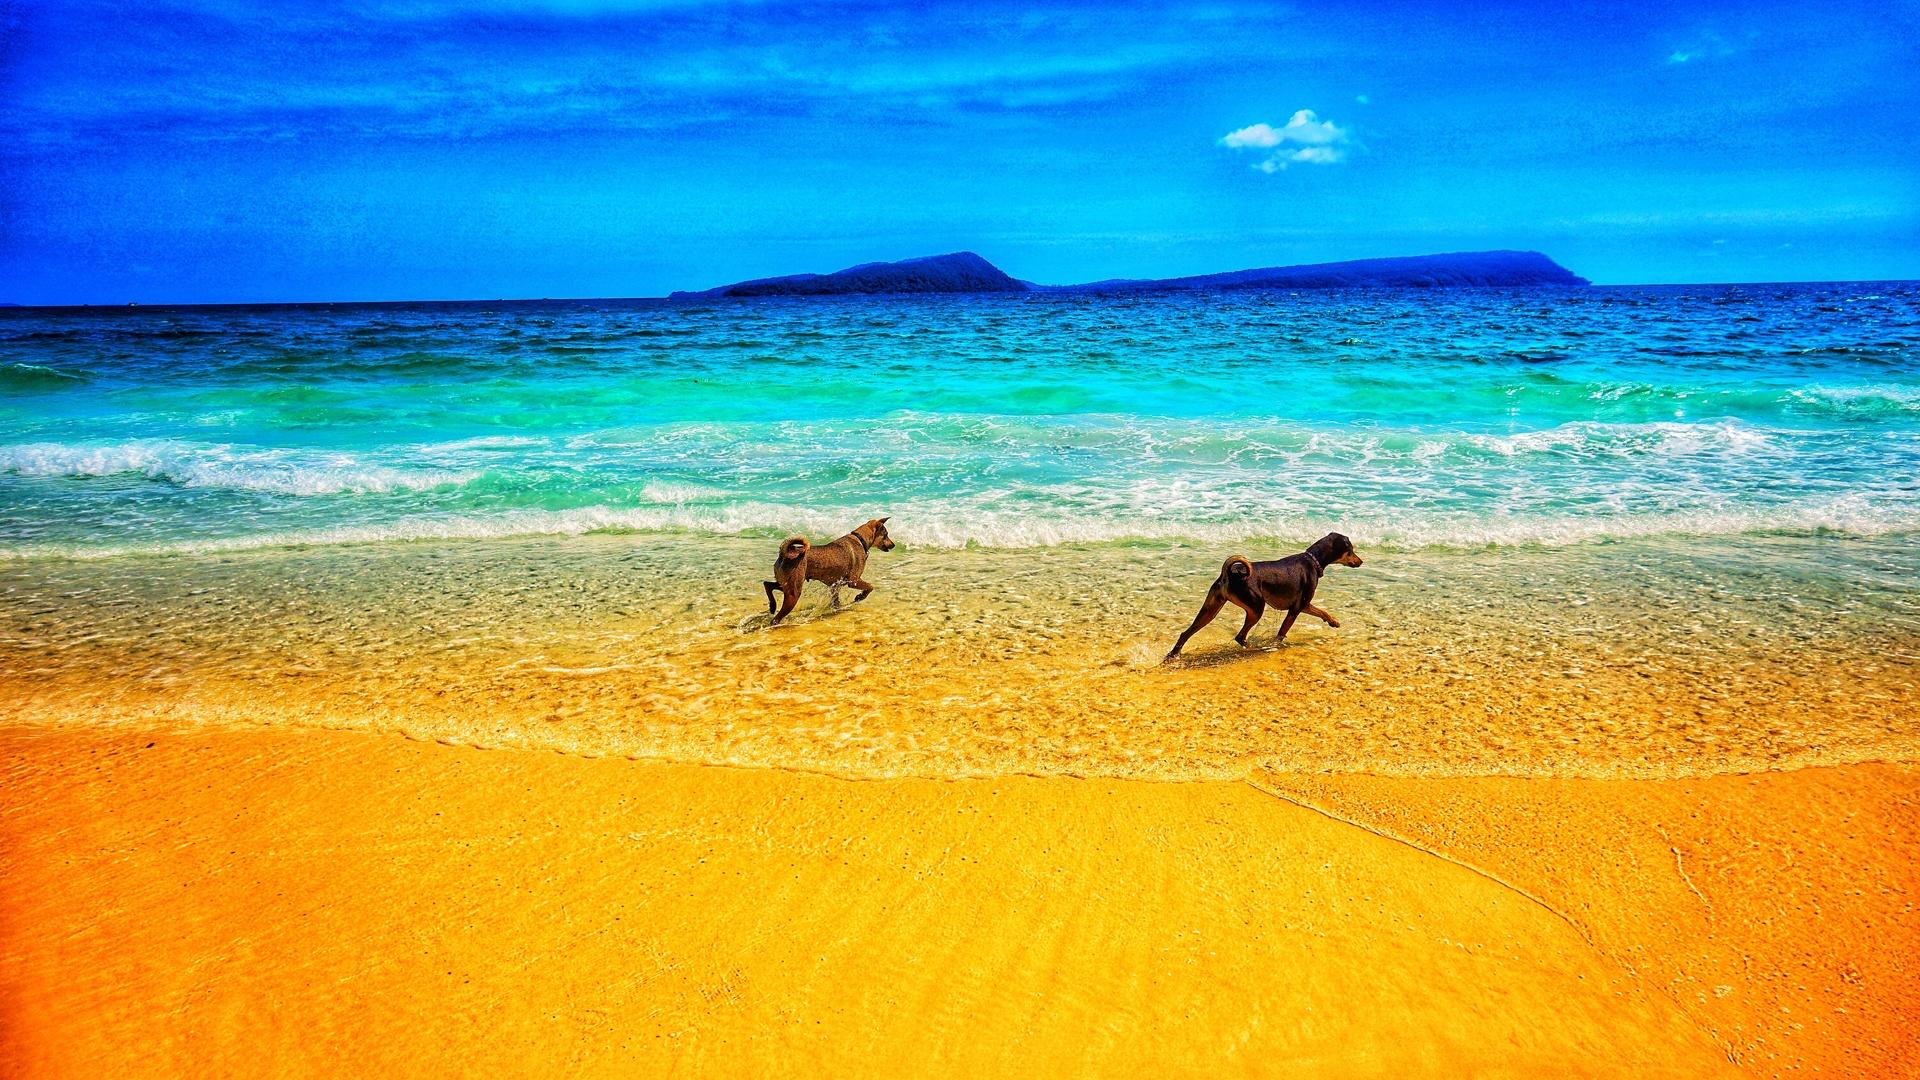 собаки, пляж, море